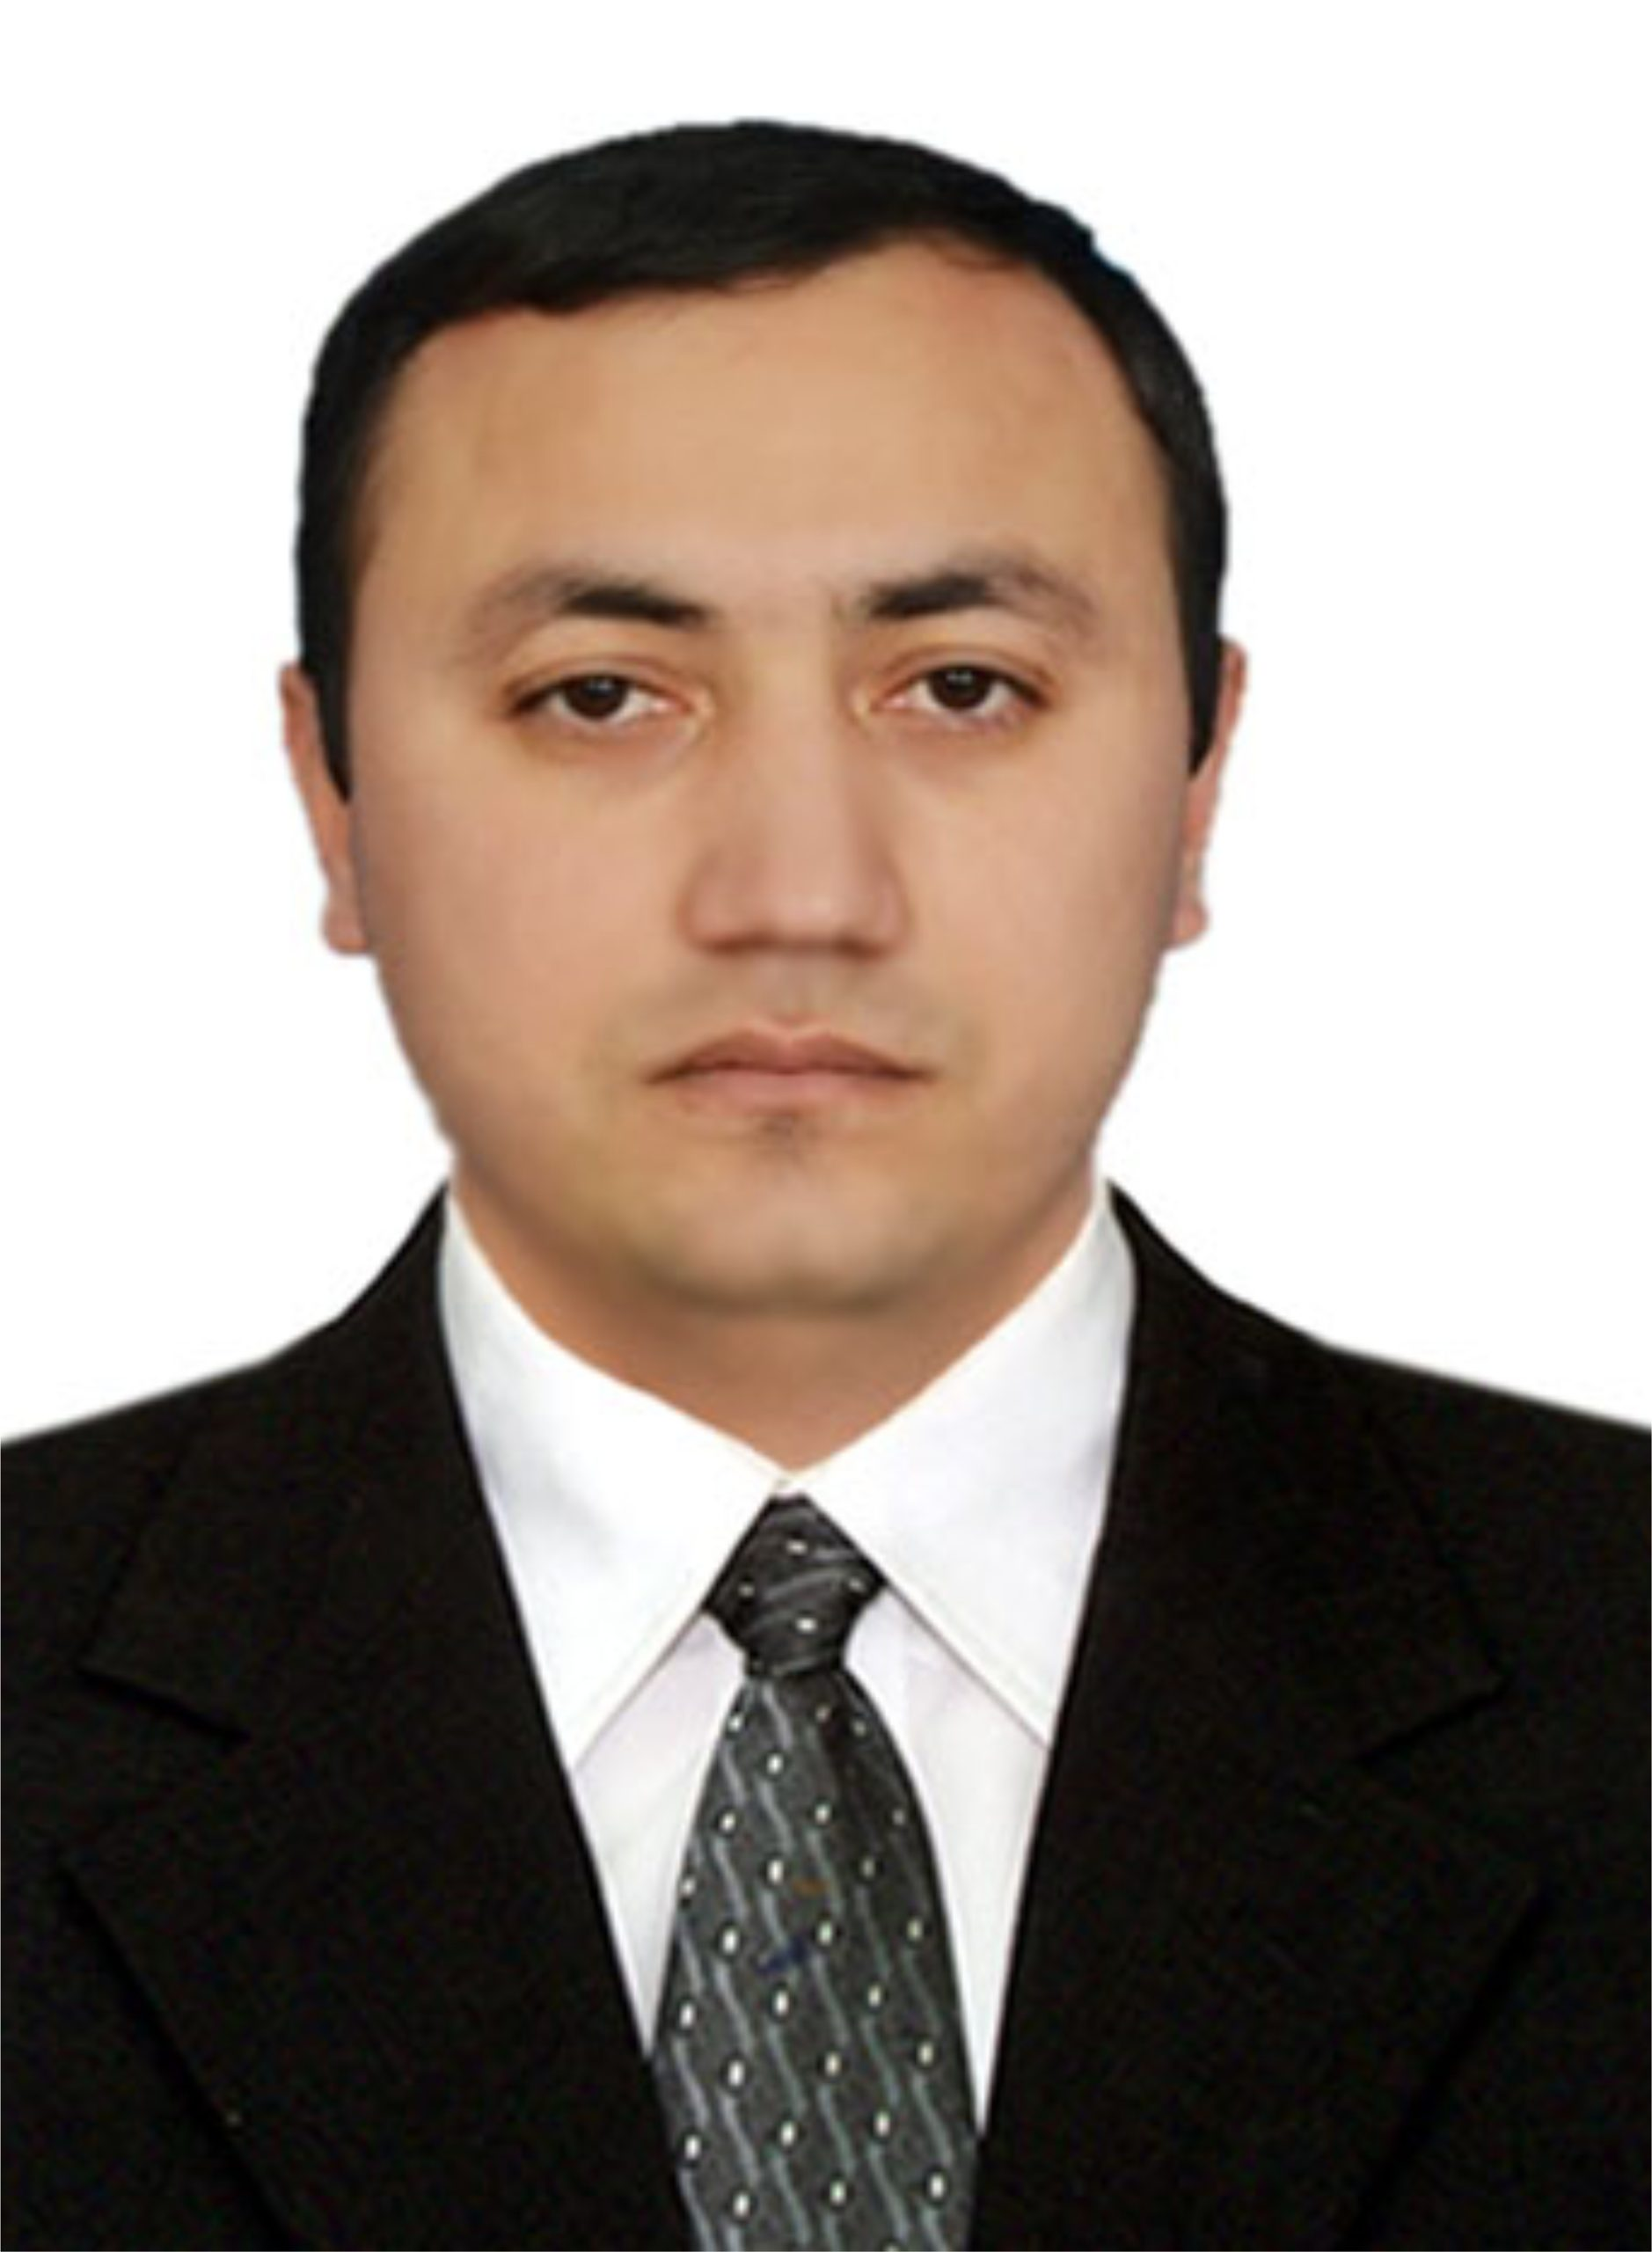 Yelmuratov Uchqun Fayzullaevich